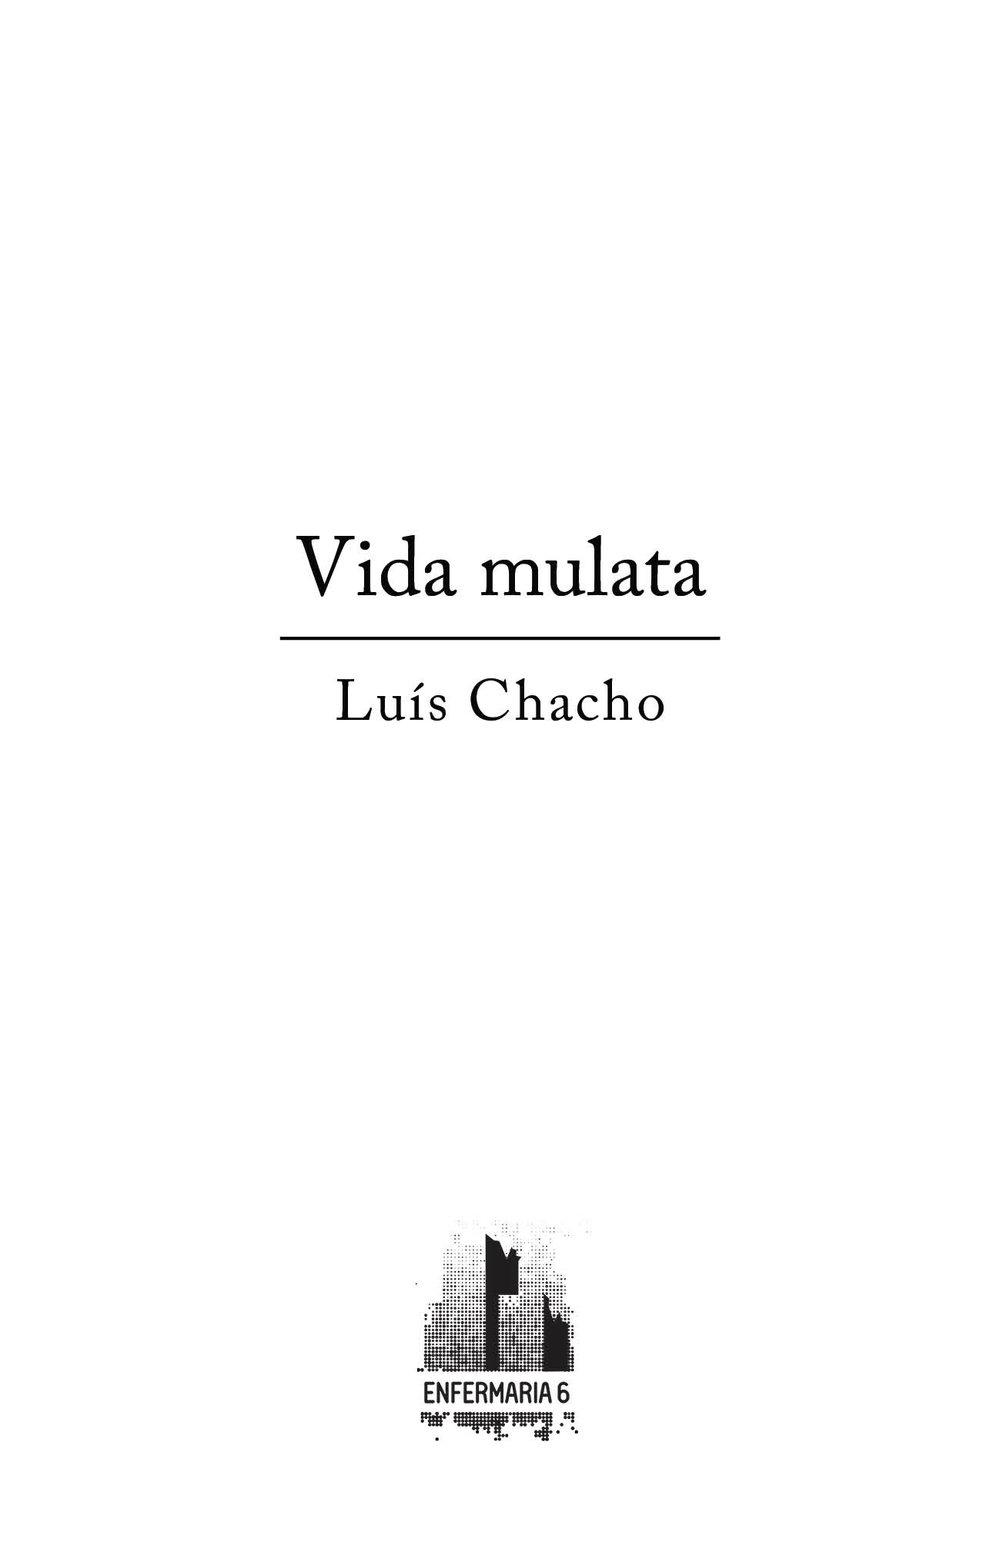 Luís Chacho, Vida mulata